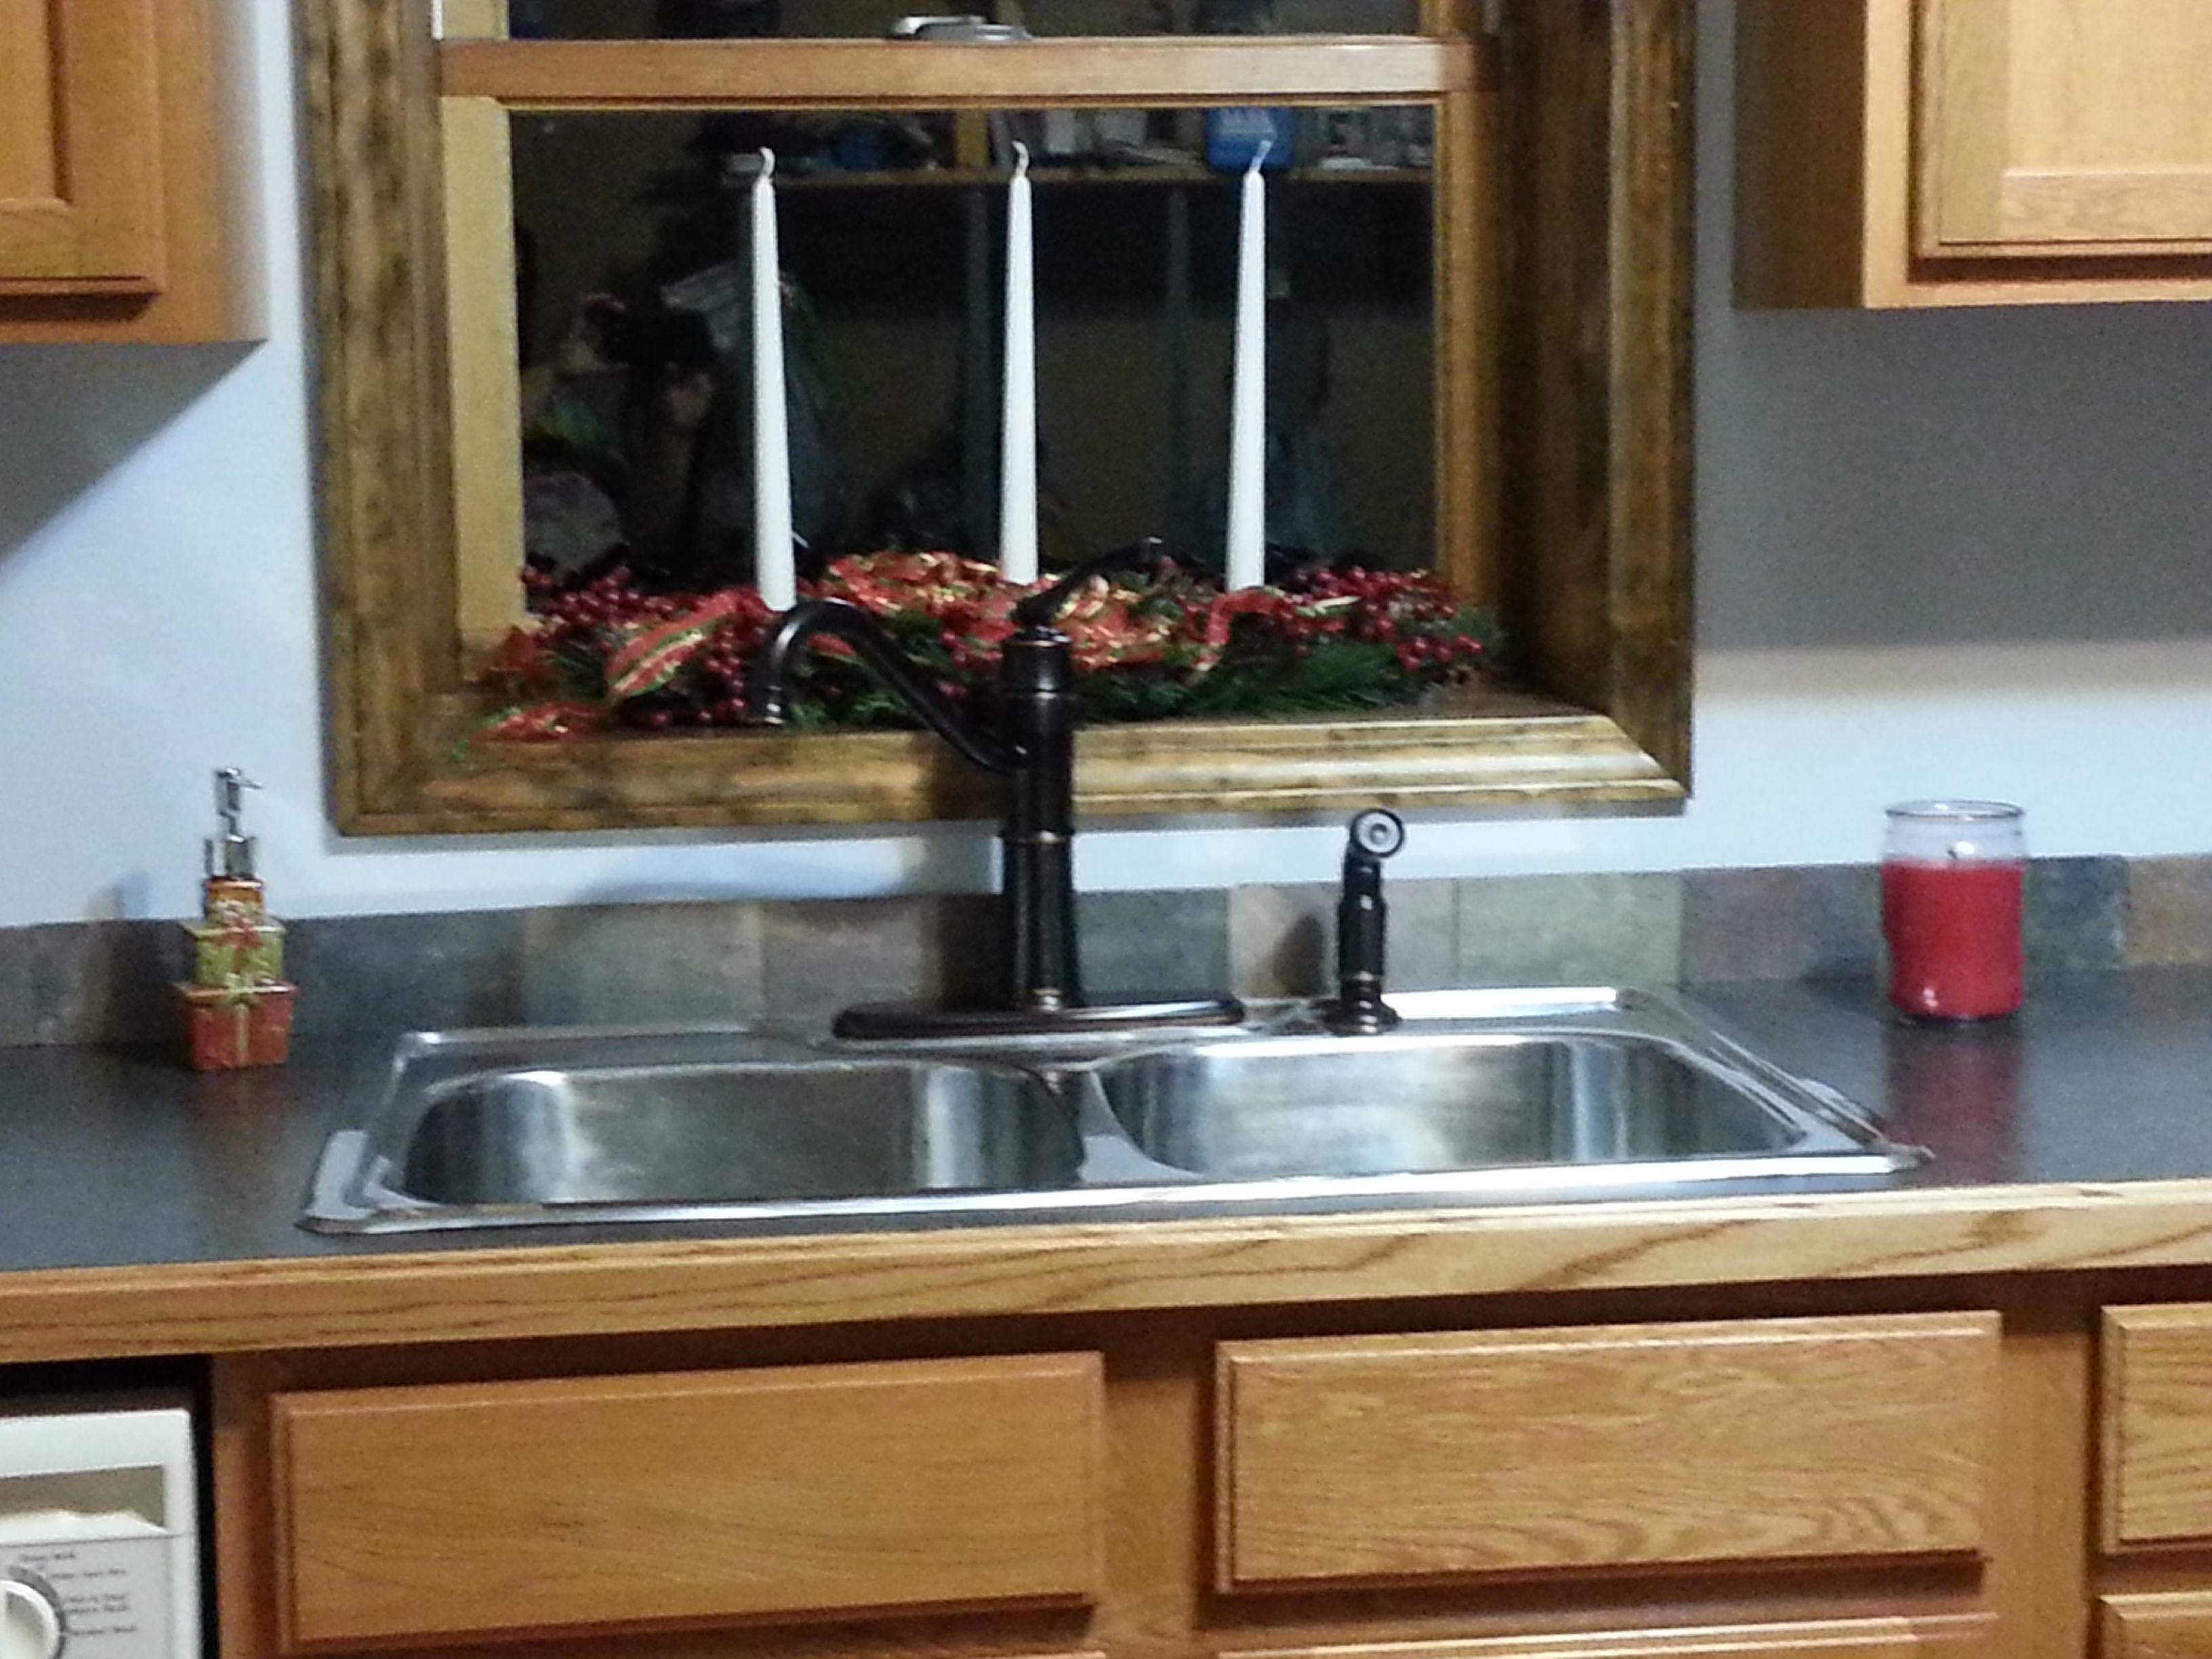 My Kitchen Sink And Countermolen Faucet Slate Tyle Backsplash Glamorous Kitchen Sink Backsplash Decorating Inspiration